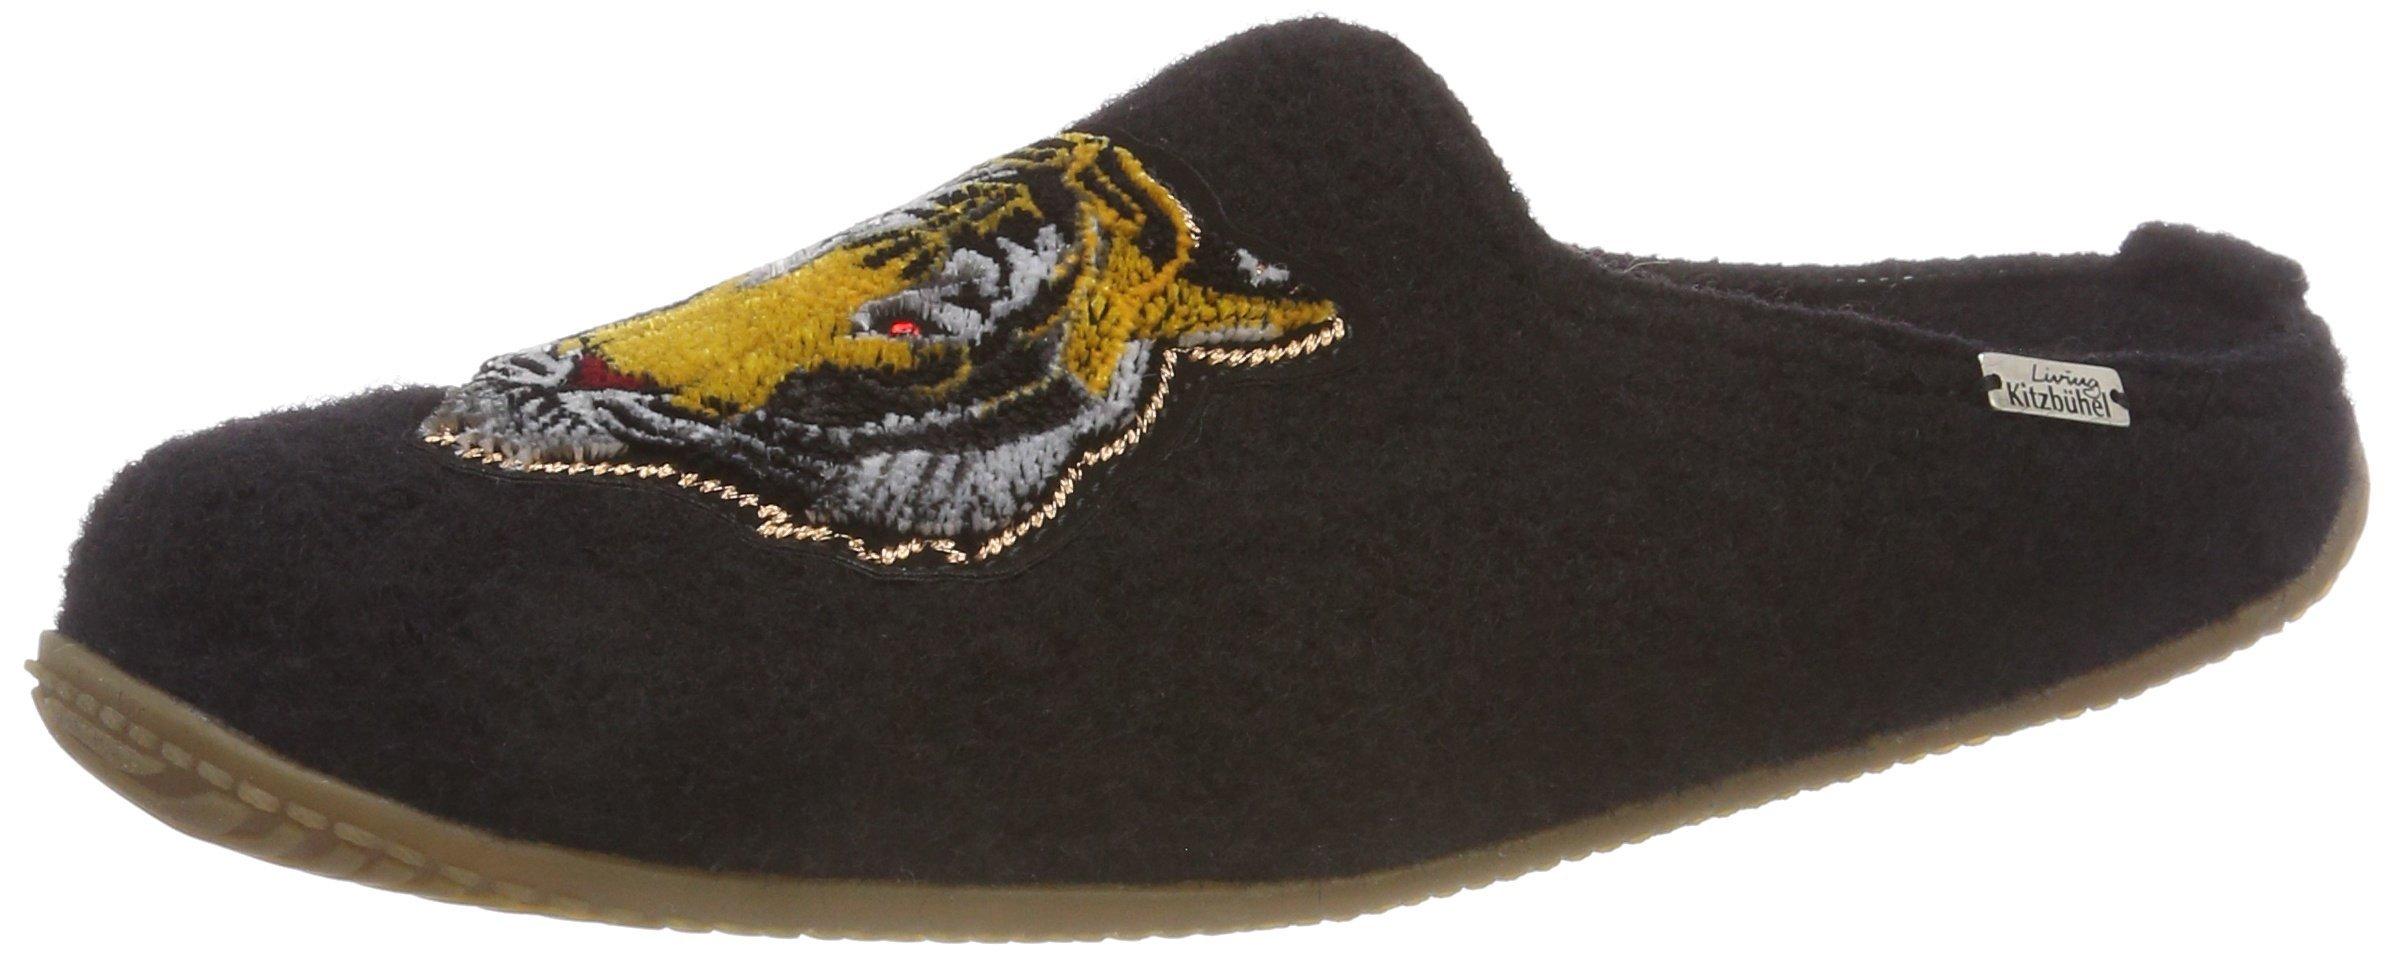 FemmeNoirschwarz Pantoffel Eu Kitzbühel Living Tiger 90039 PatchPantoufles mn0yNvO8w